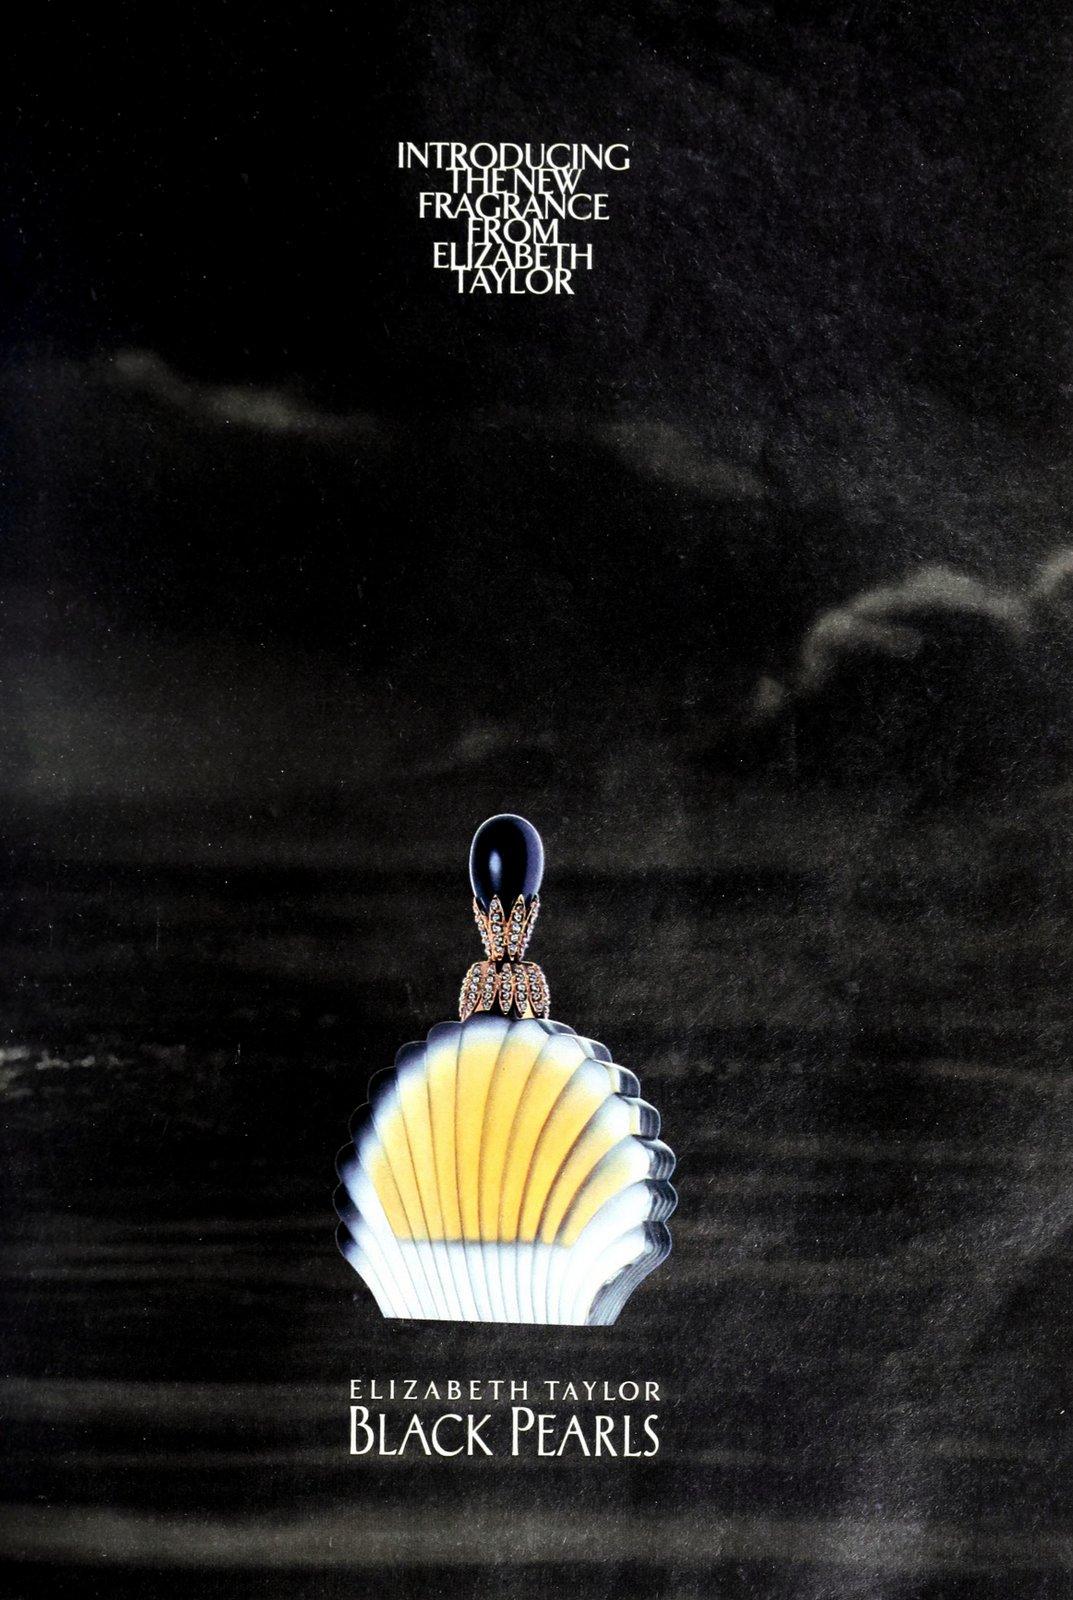 Black Pearls vintage fragrance from Elizabeth Taylor (1995) at ClickAmericana.com